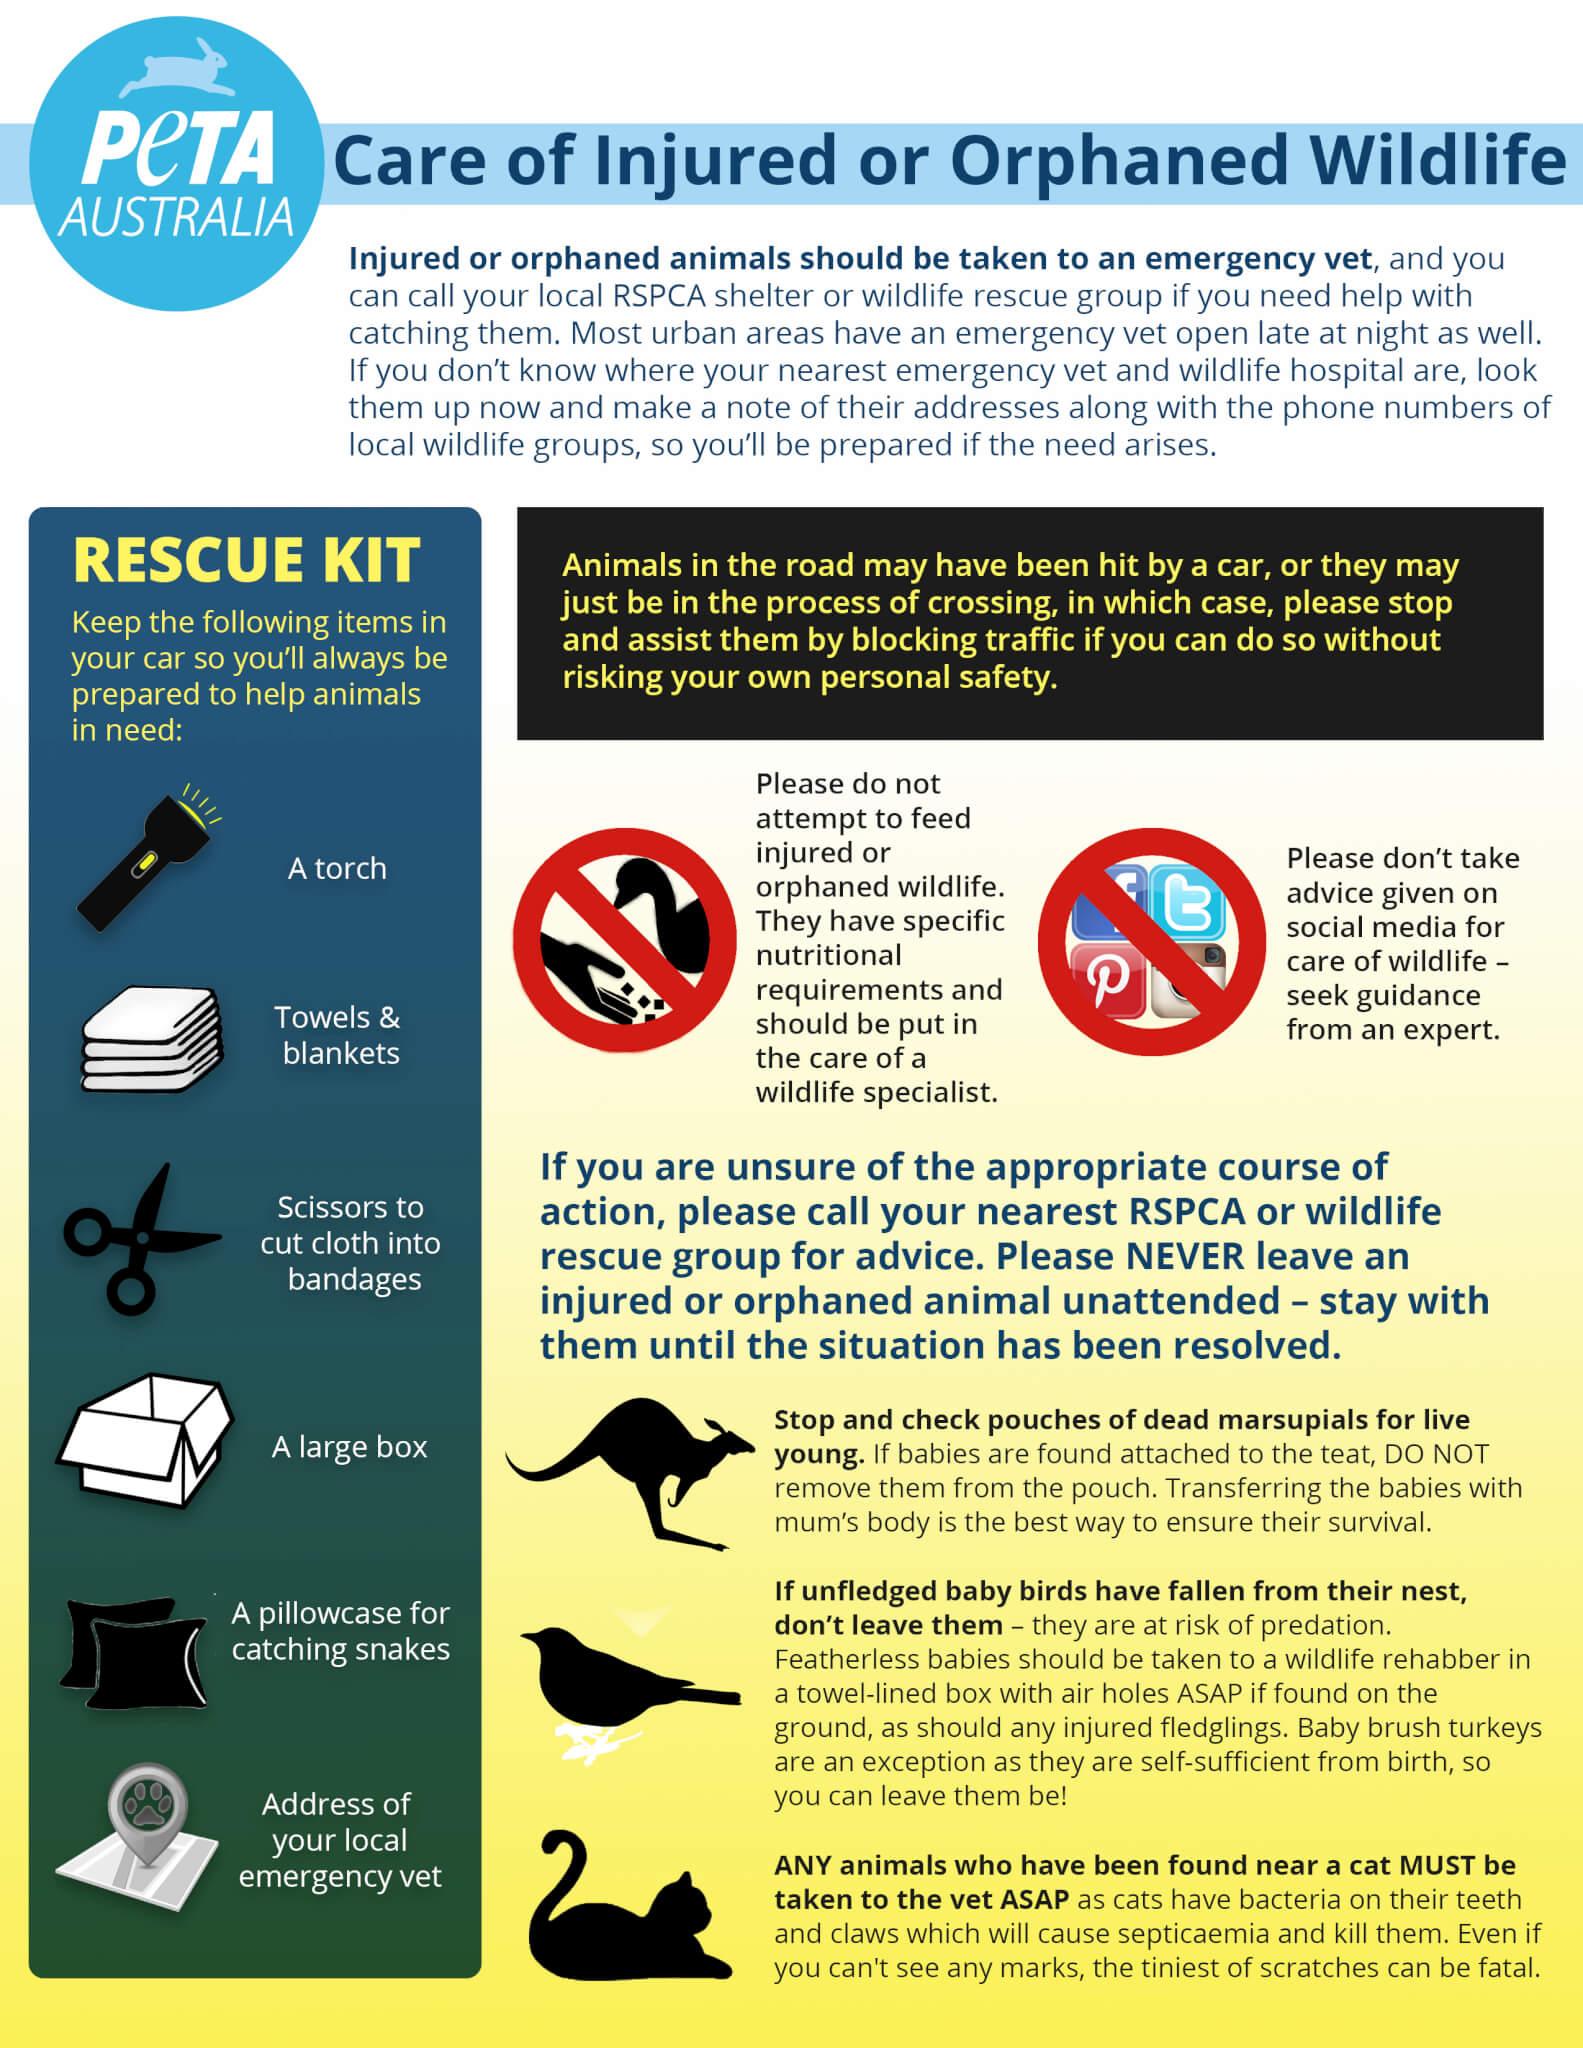 PETA Australia Injured Wildlife Infographic